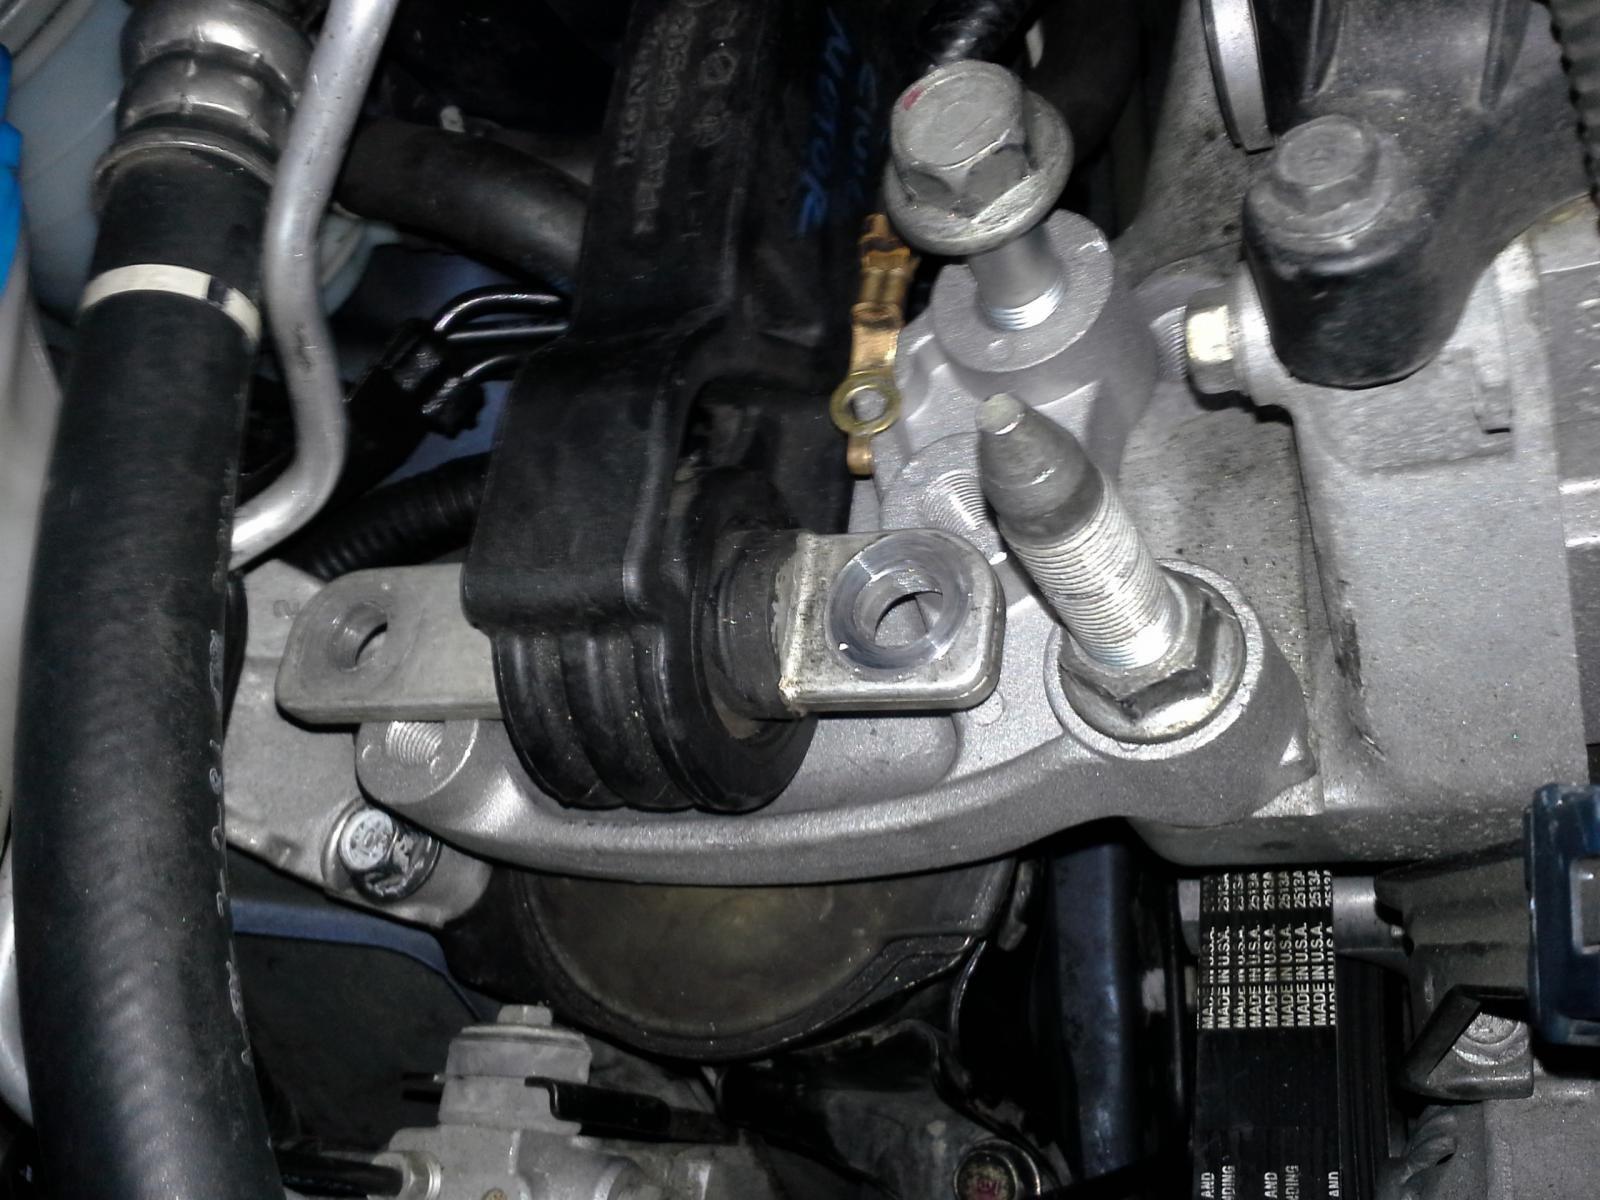 High Quality ... R18 Motor Mount Diy 20140303_180154 ...